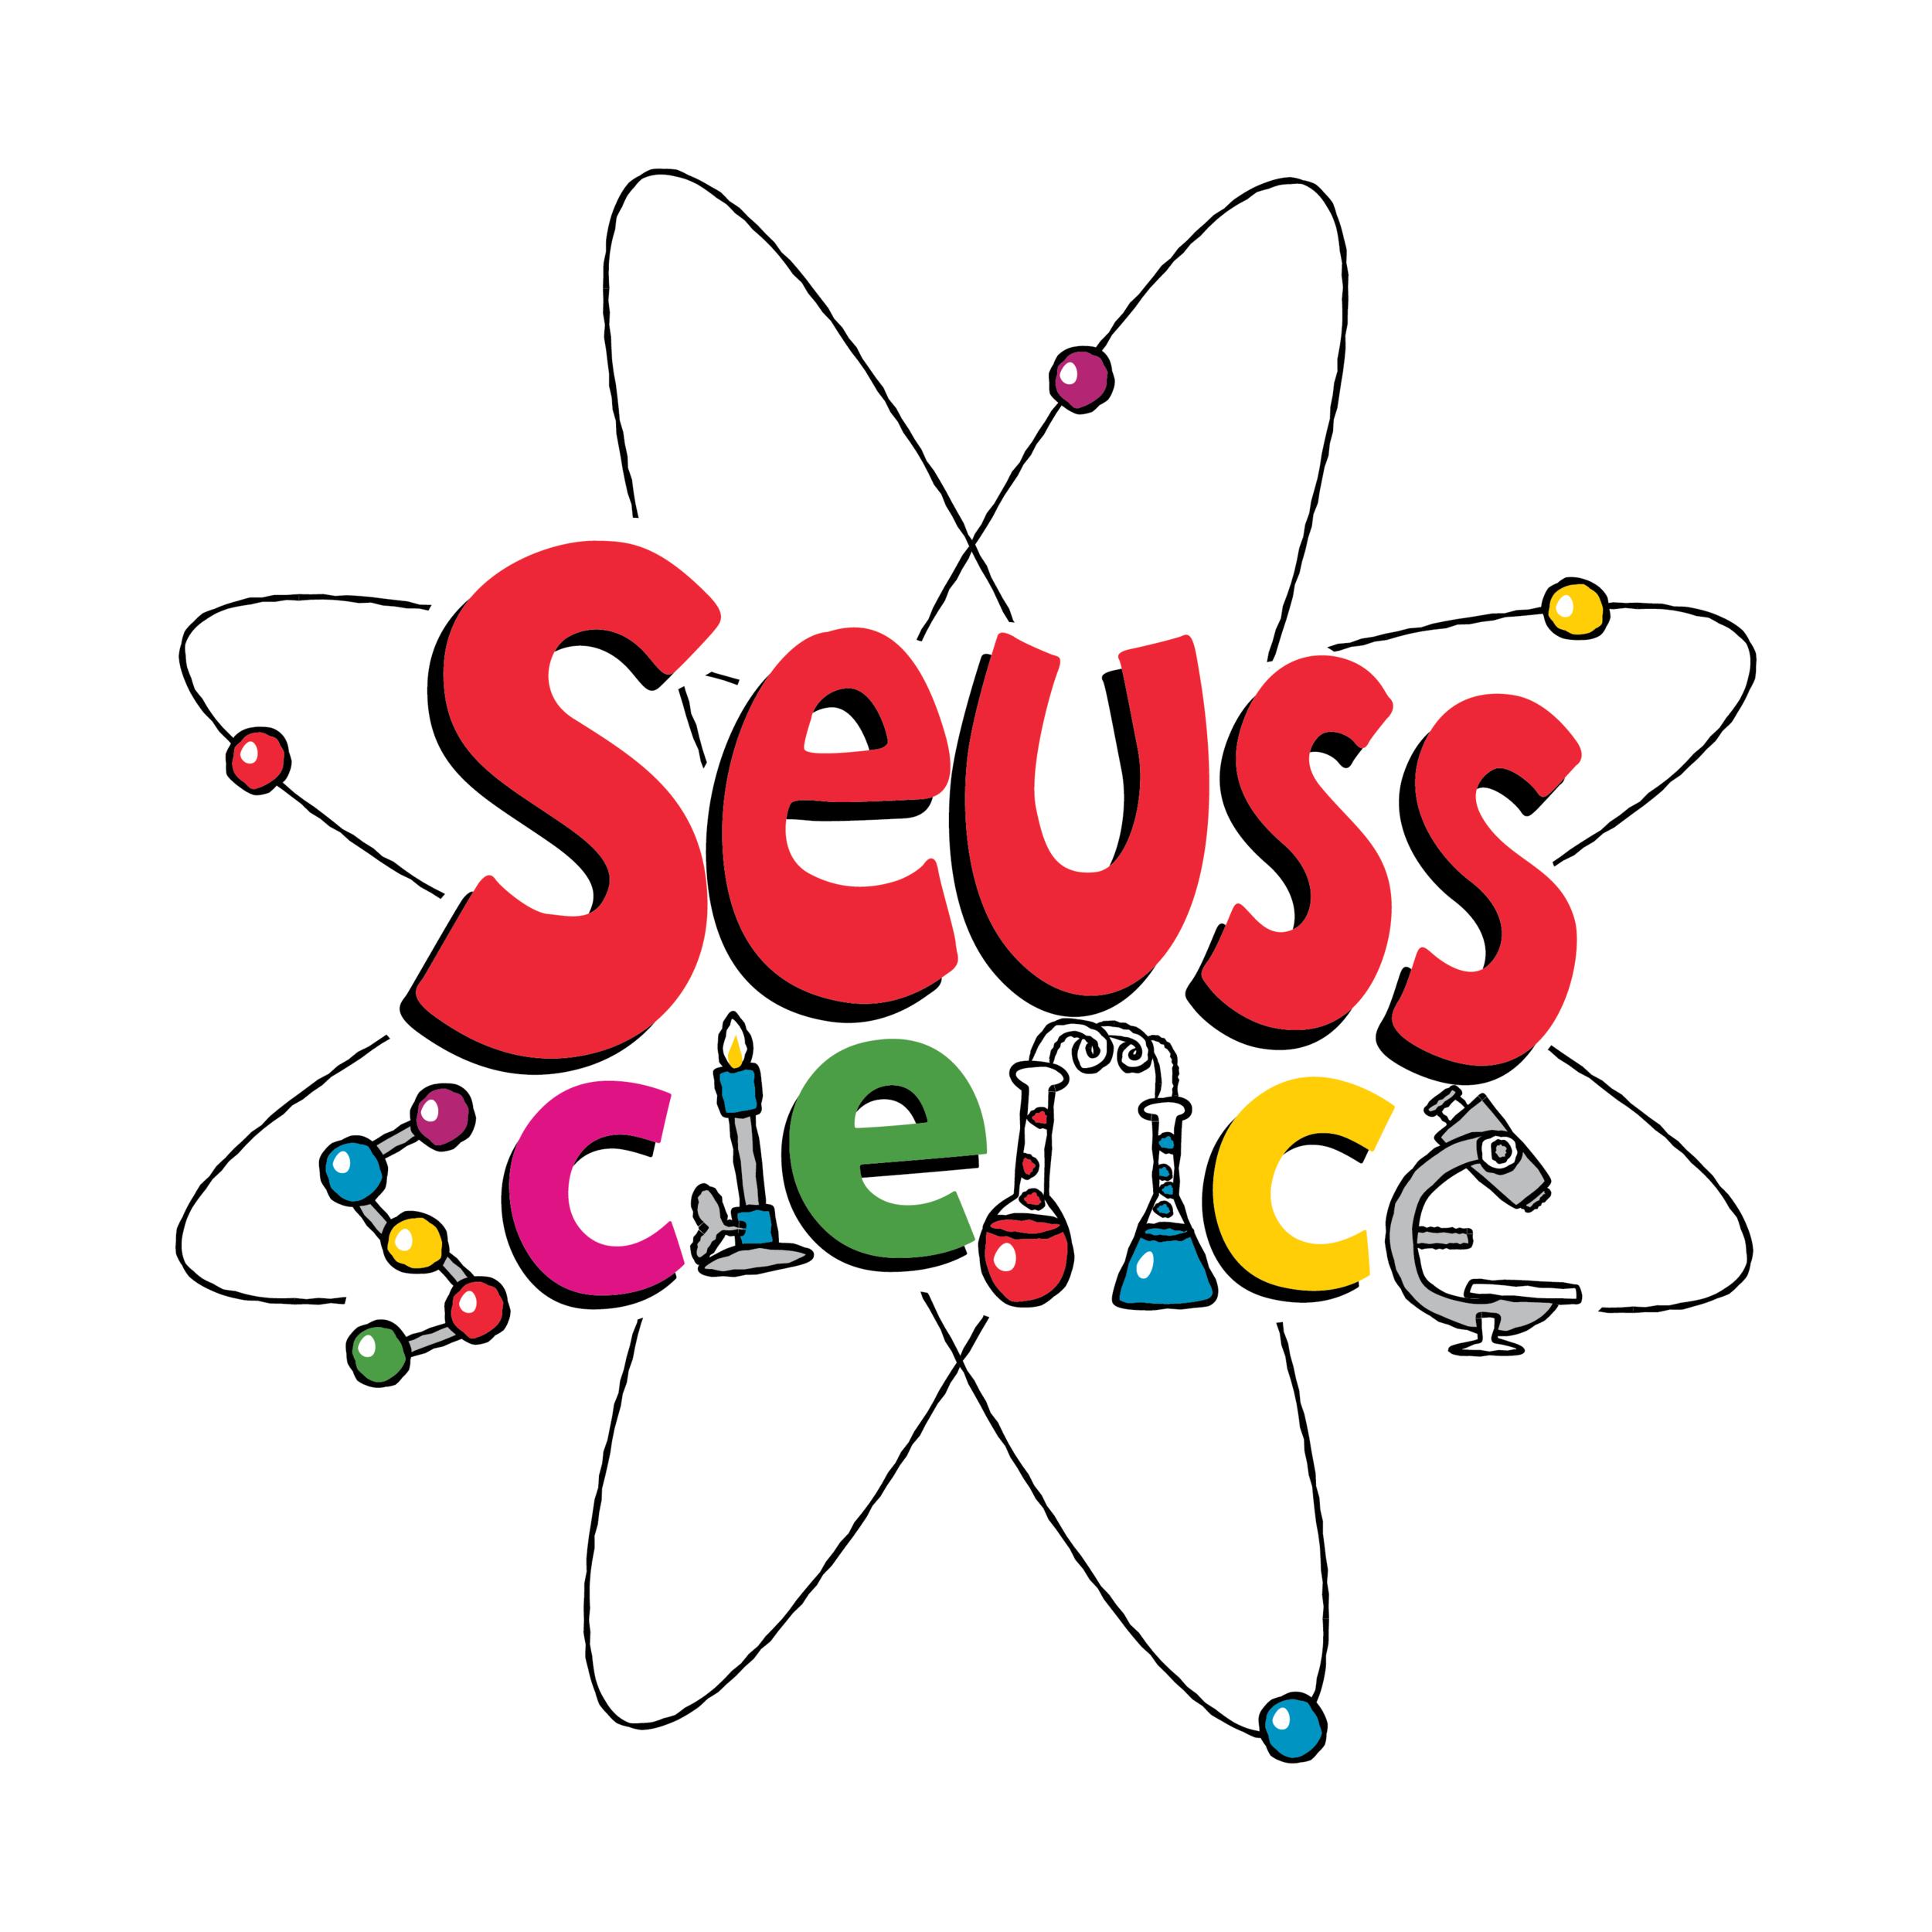 Seuss_Science_Logo.png